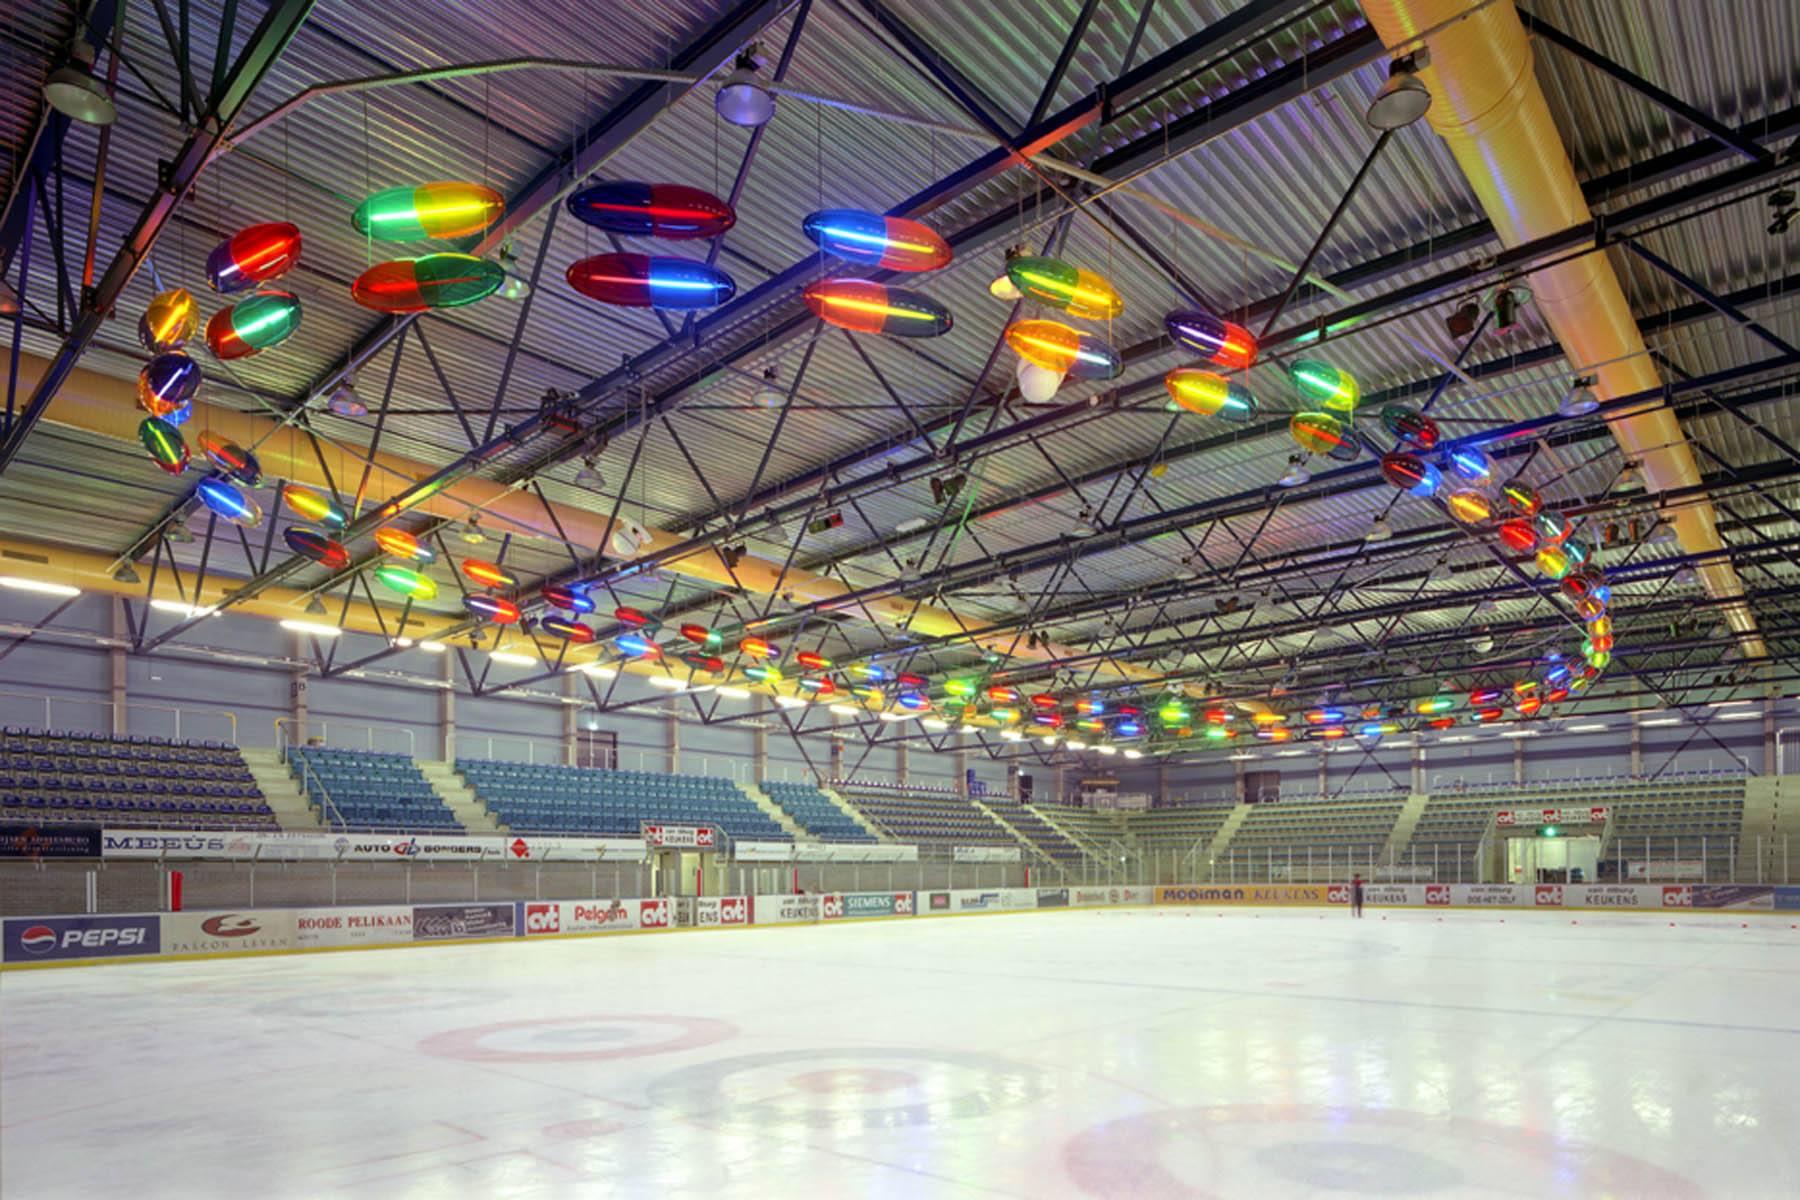 Lightart IJssporthal Tilburg, 2000